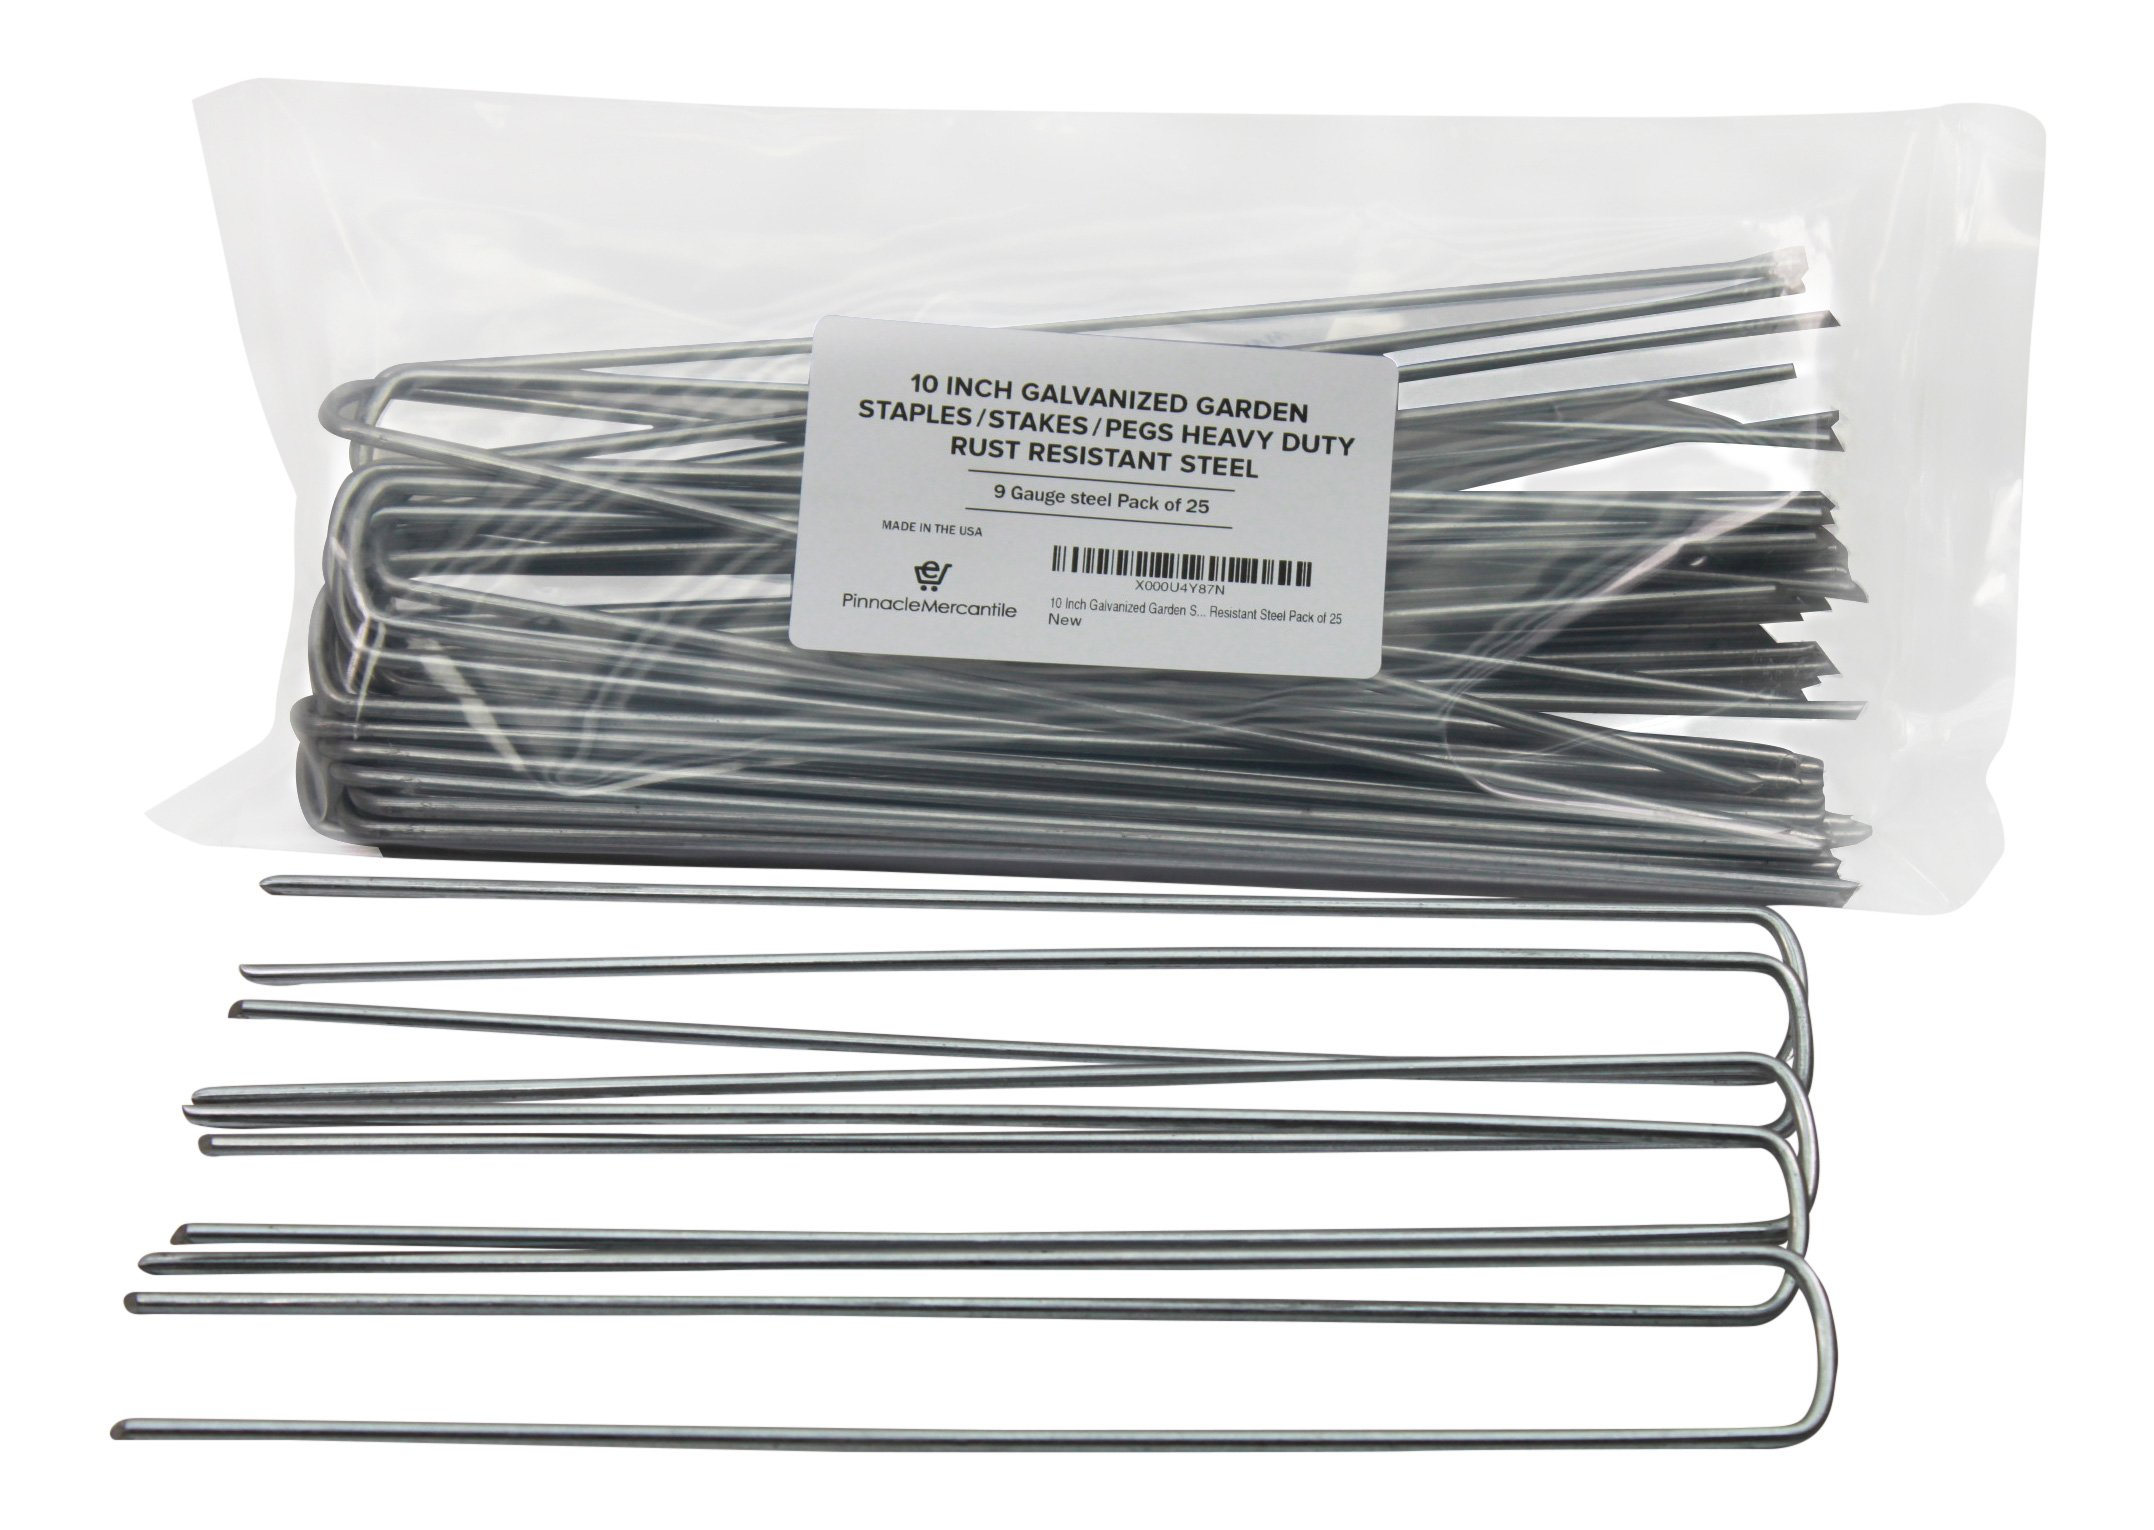 Pinnacle Mercantile 10 Inch Galvanized Garden Staples/Stakes/Pegs Heavy Duty Rust Resistant Steel Pack of 25 by Pinnacle Mercantile